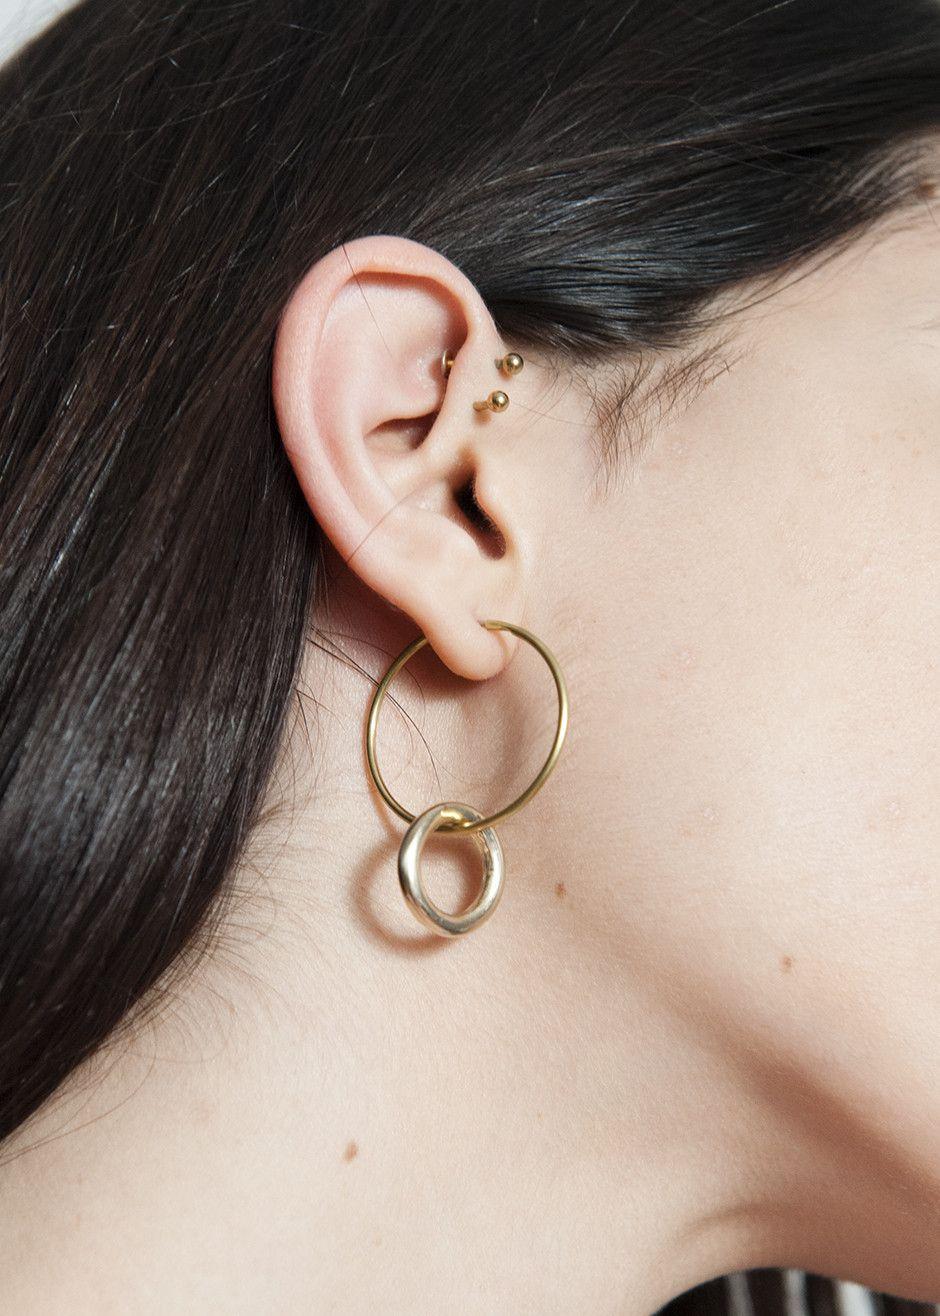 Vintage And Repurposed Material Br Hoop Pierced Earrings With Plated Ring Detail Surgical Steel Ear Wire Large Measures 30mm In Diameter